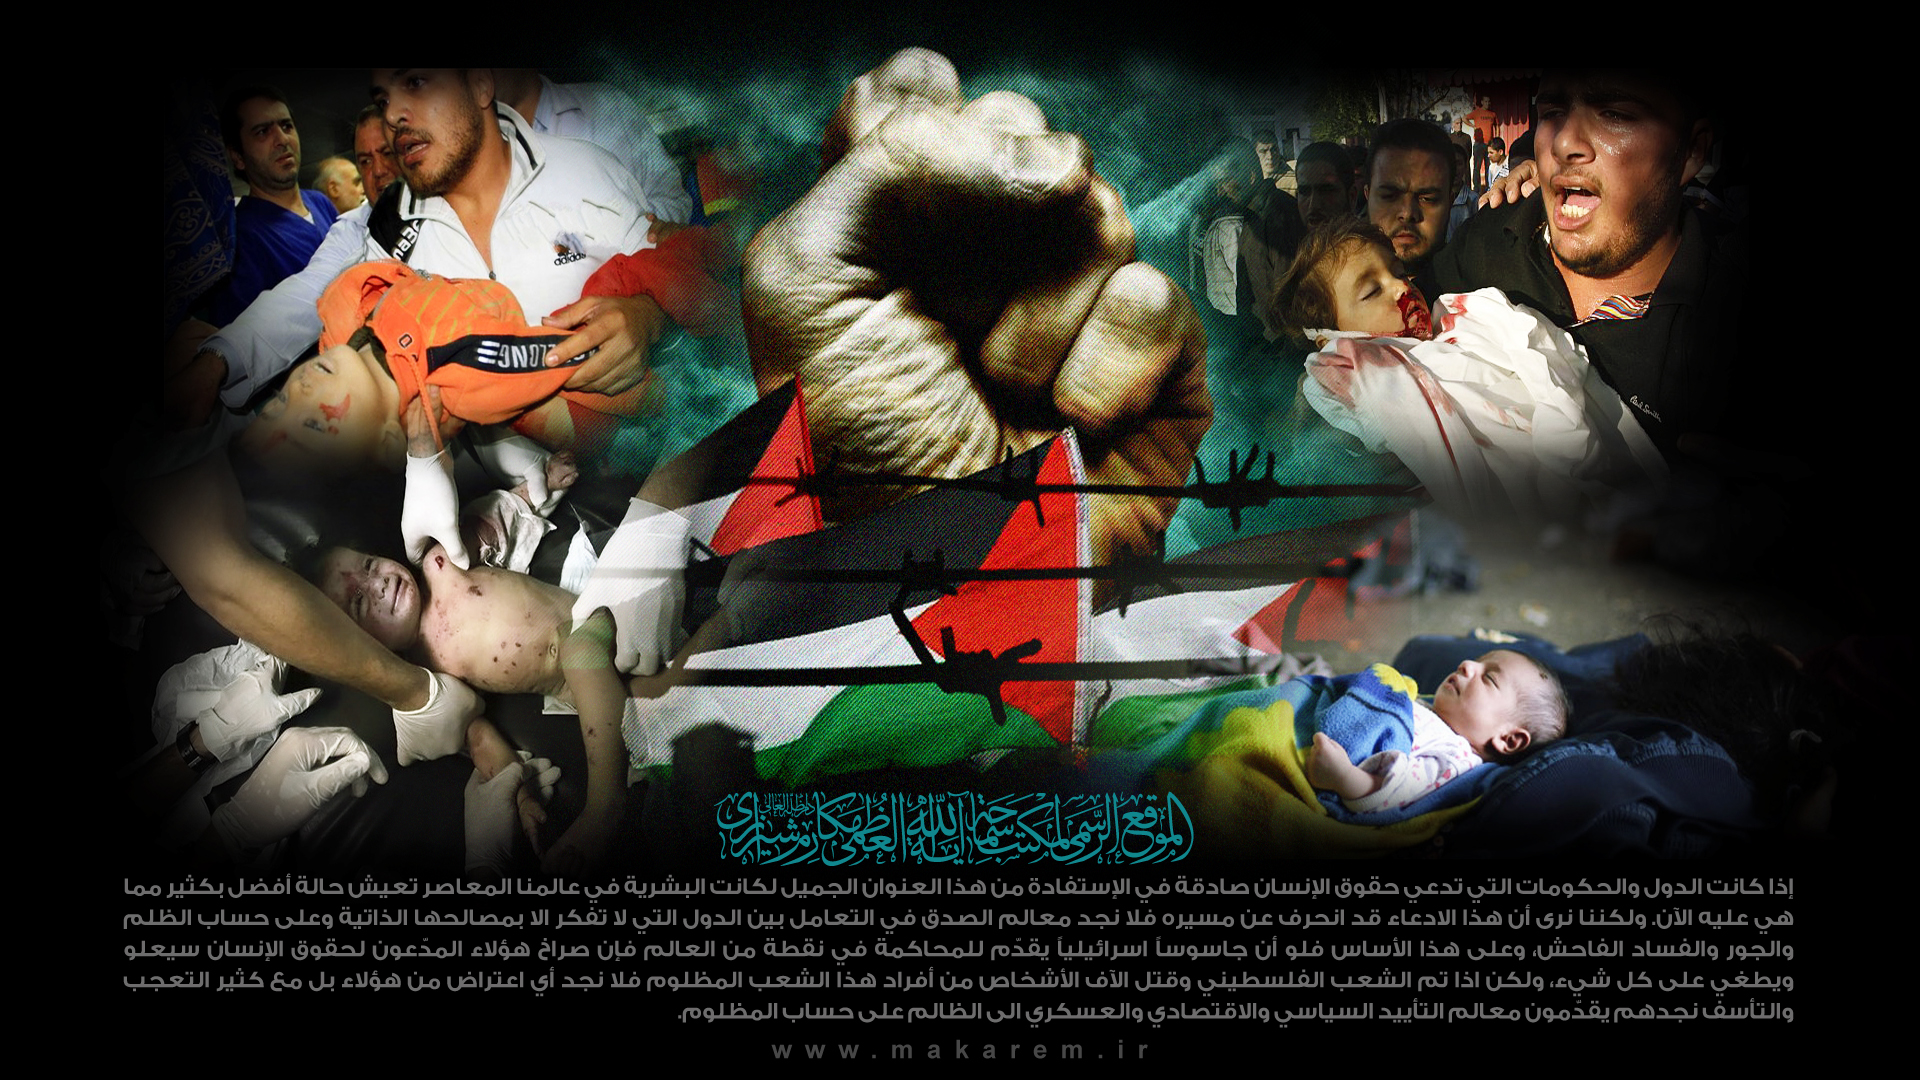 فلسطین-مدرسه الامام امیر المومنین (ع)